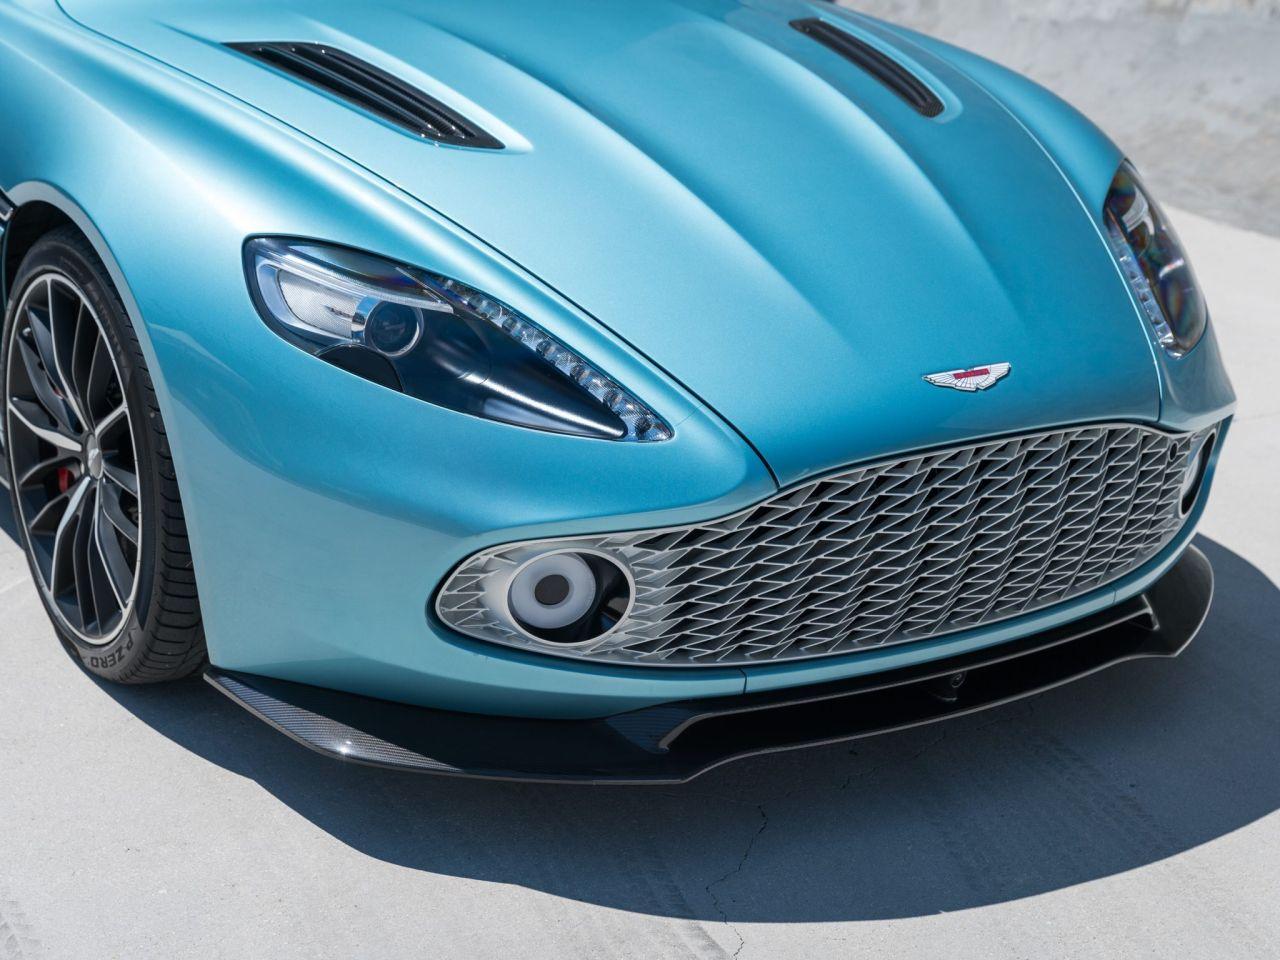 Aston Martin Vanquish By Zagato - Lady Signorina 5